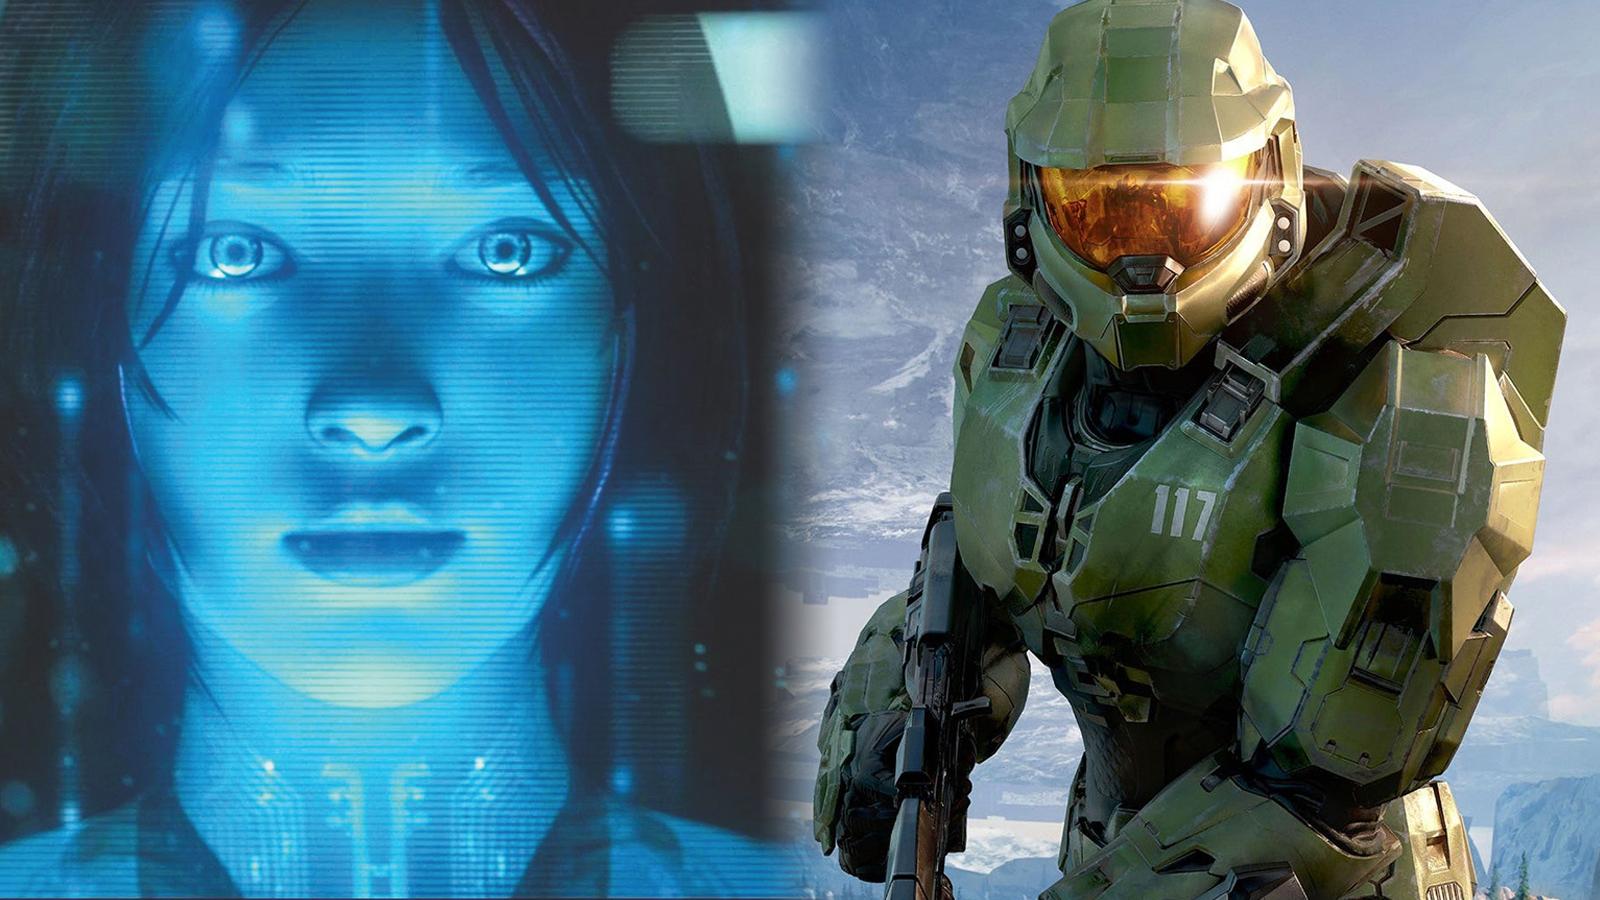 Cortana Halo TV series